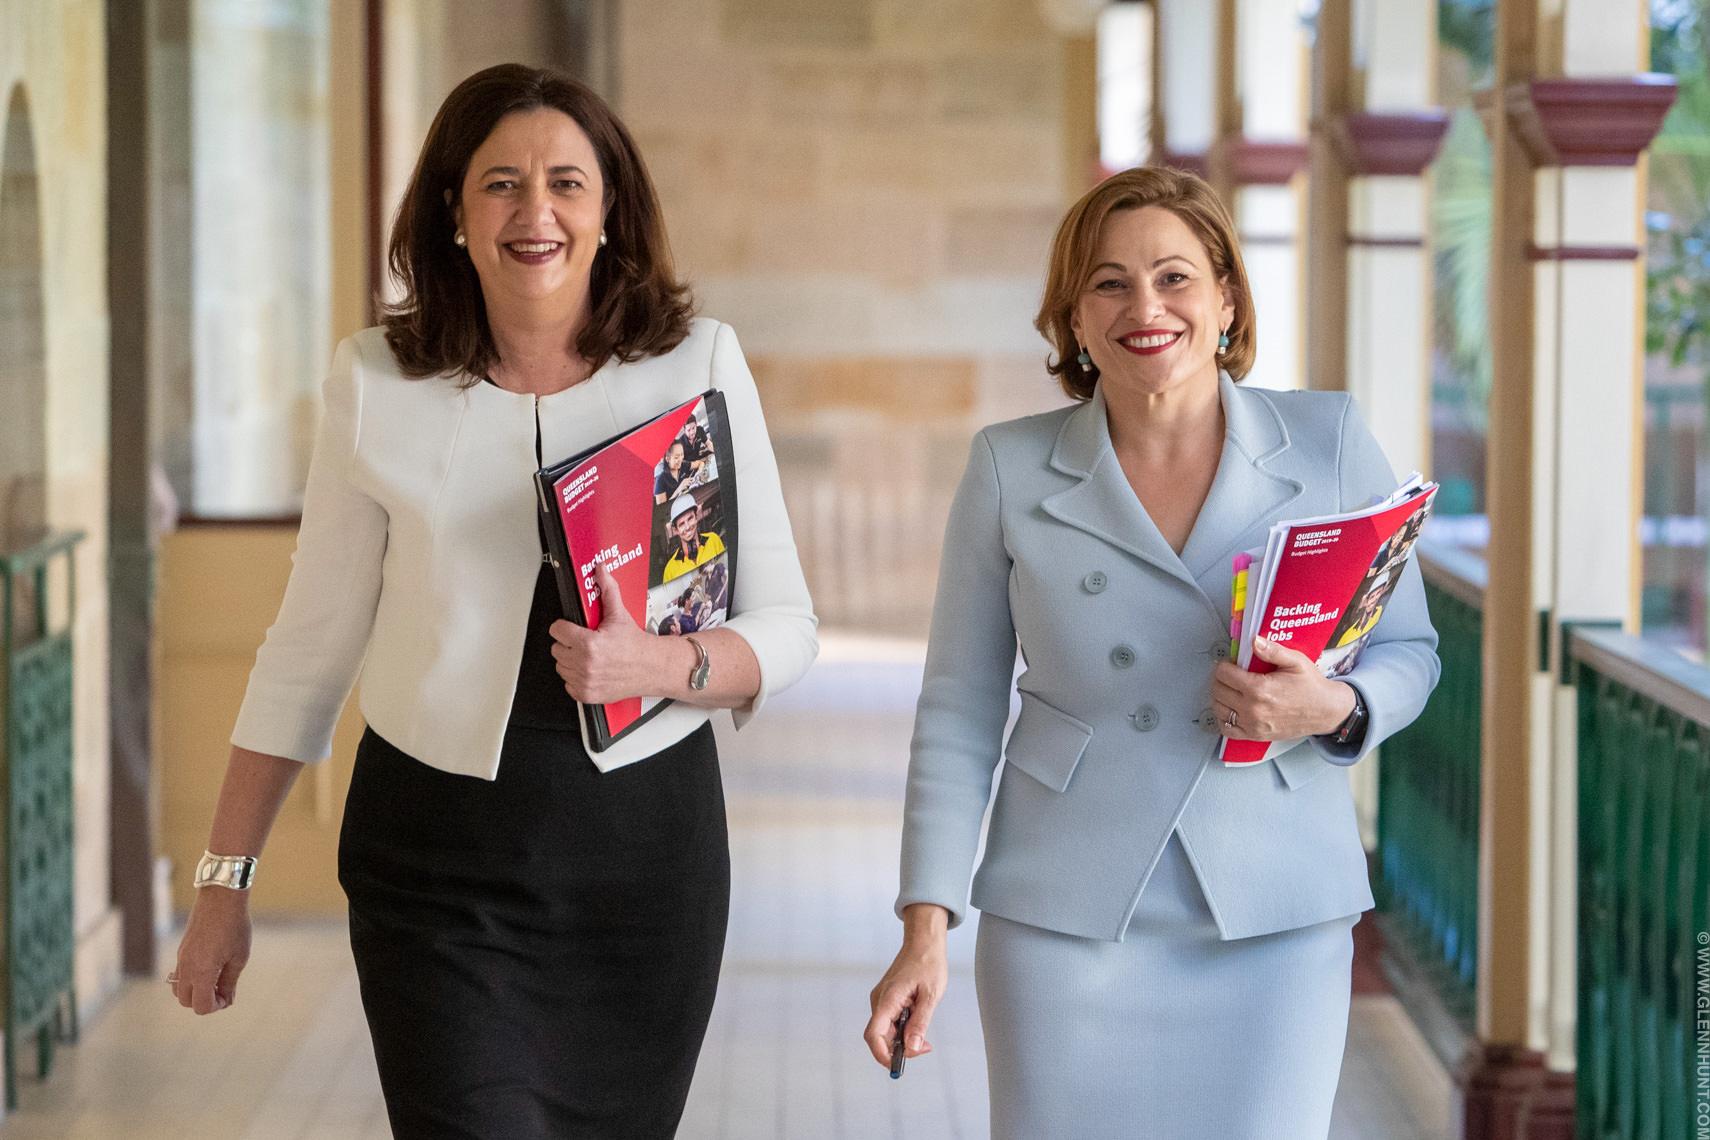 Queensland Premier Annastacia_Palaszczuk and Jackie Trad